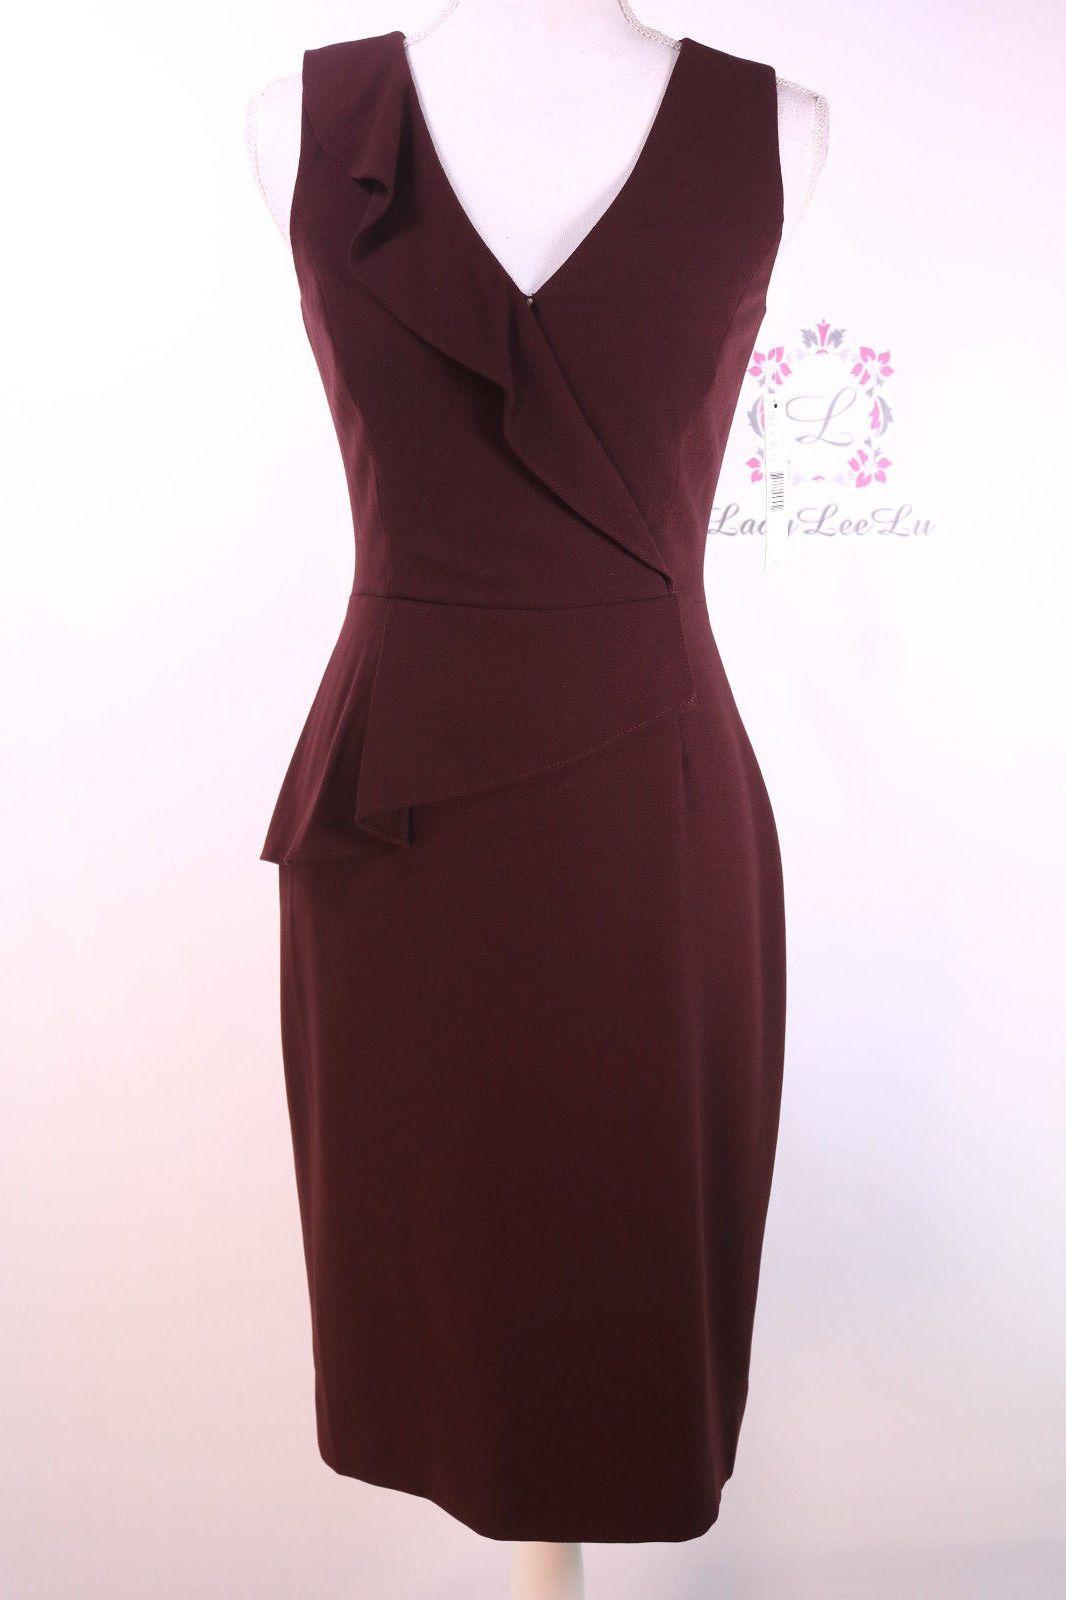 59d7745a6e7 Antonio Melani Dress Brown Silvia Crepe Sheath Dress Size 0 2 4 6 8 10 12